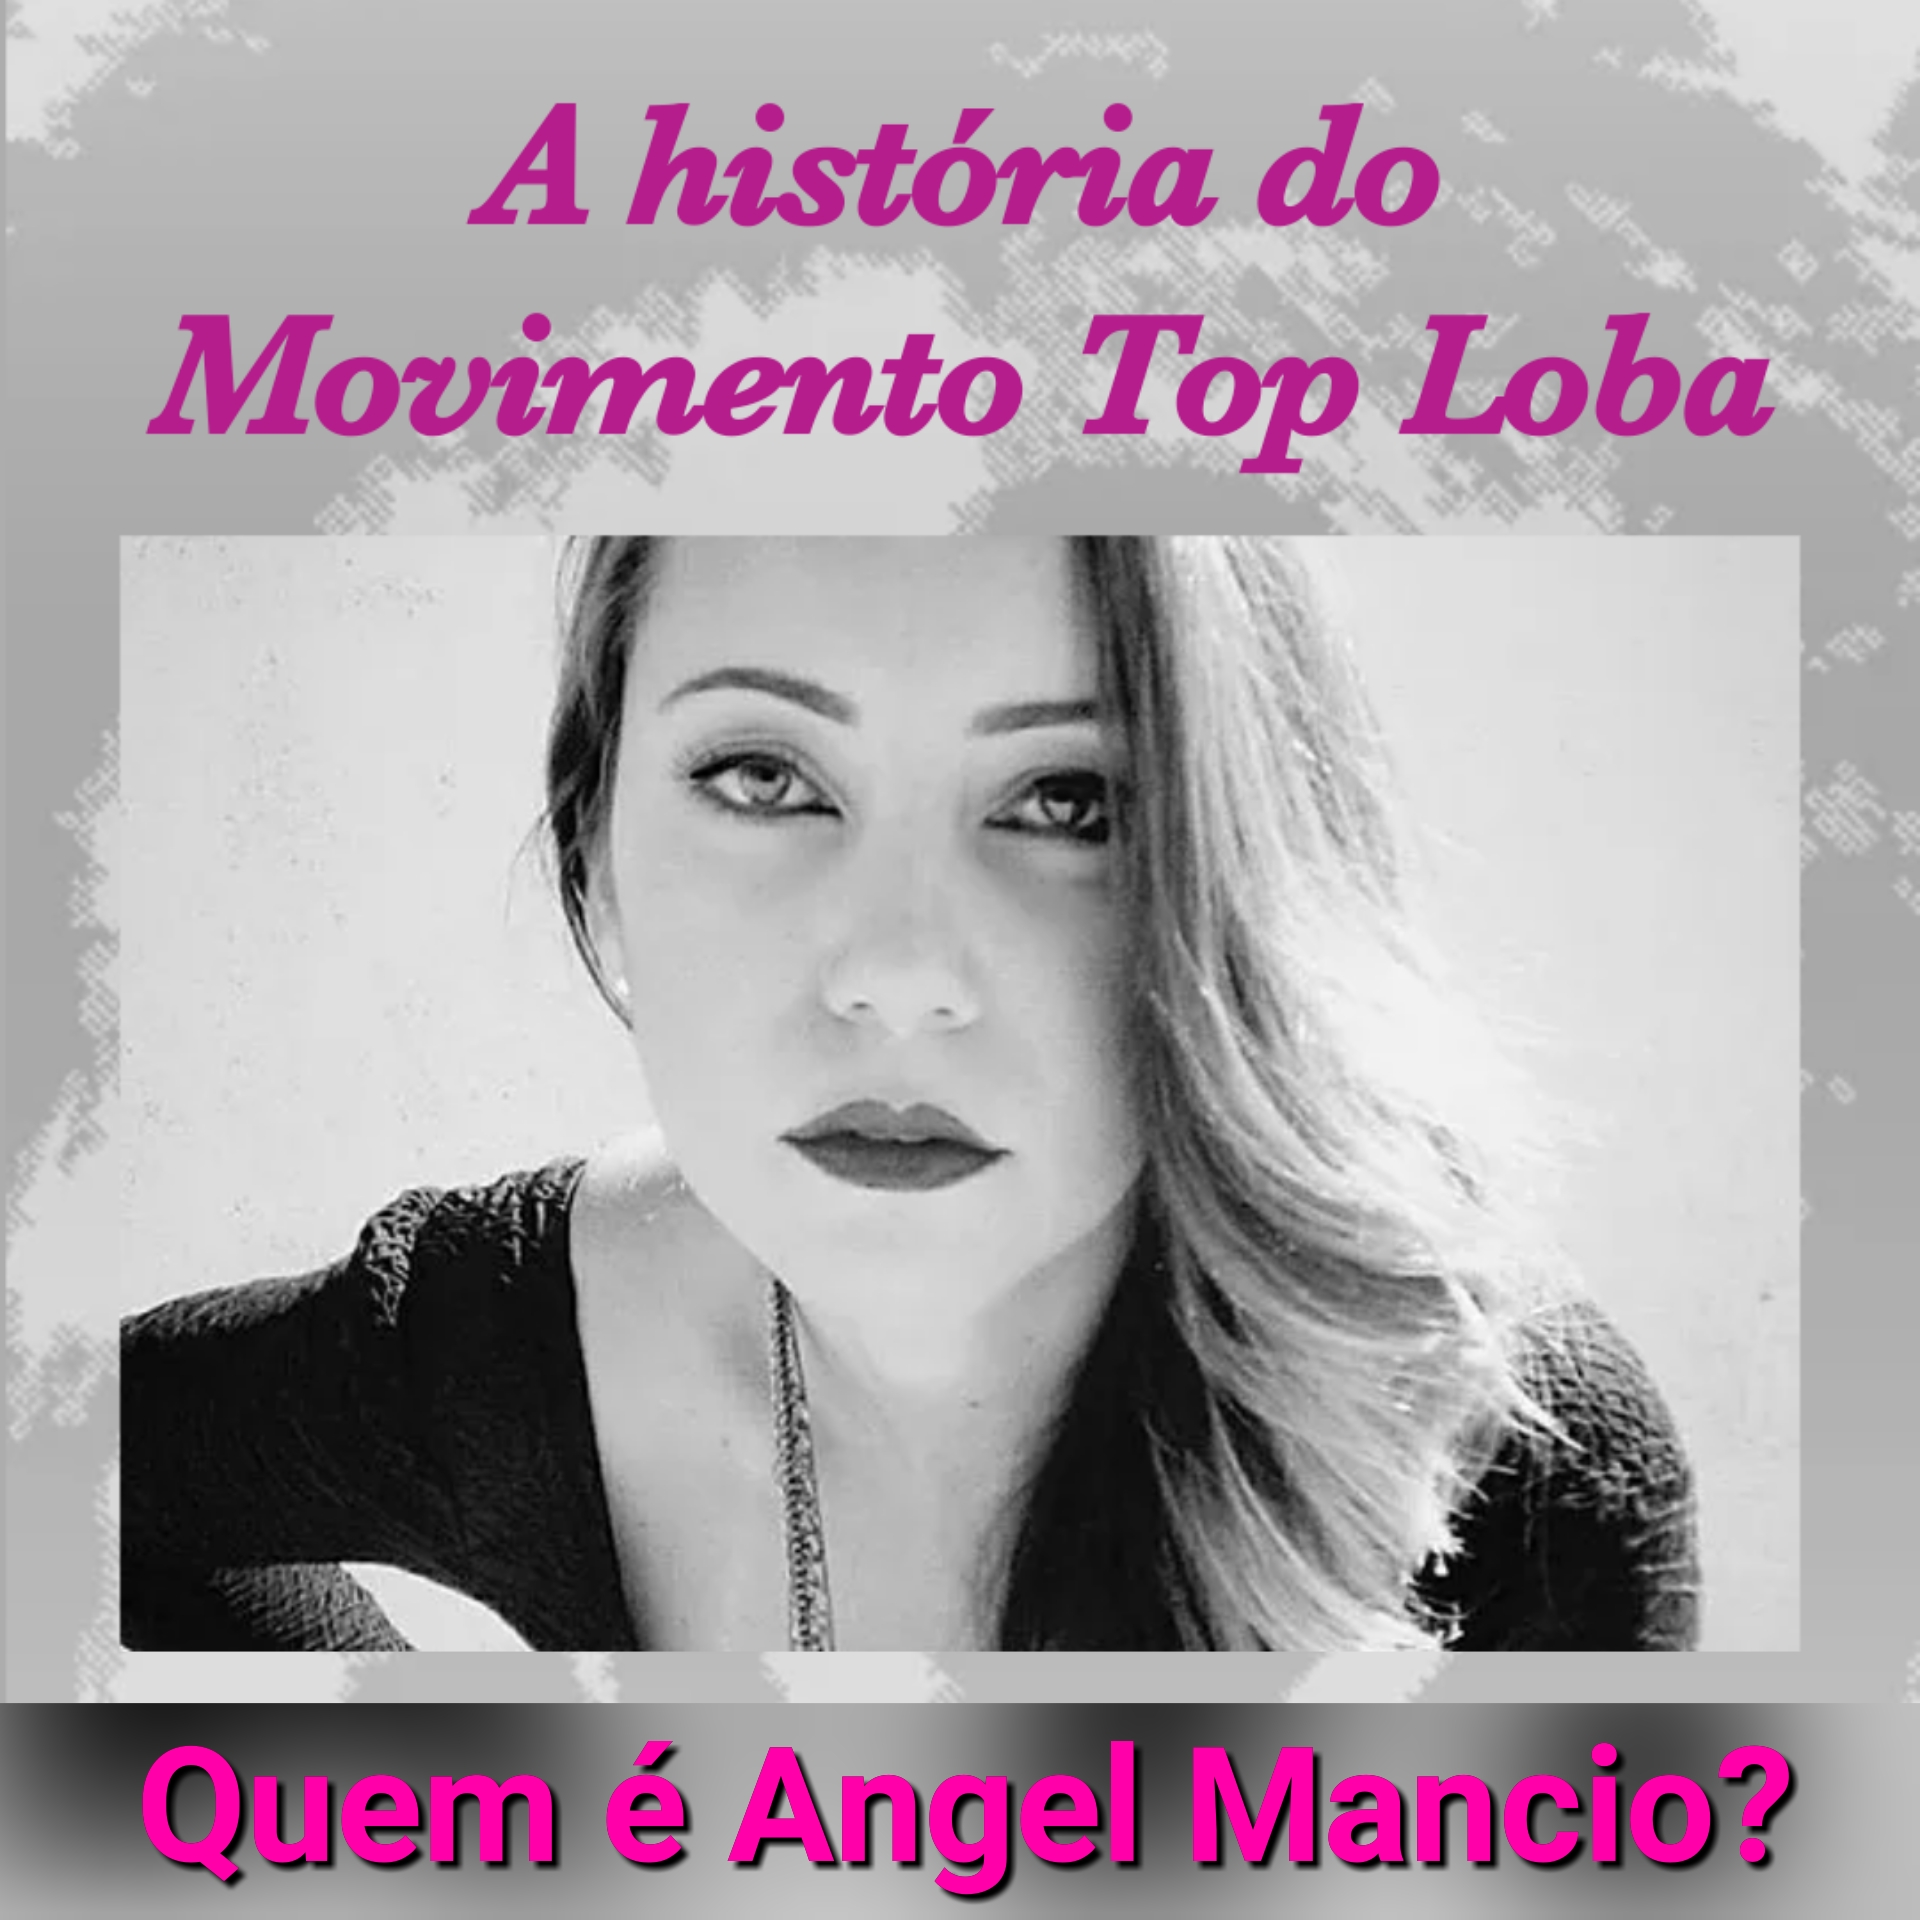 Movimento Top Loba